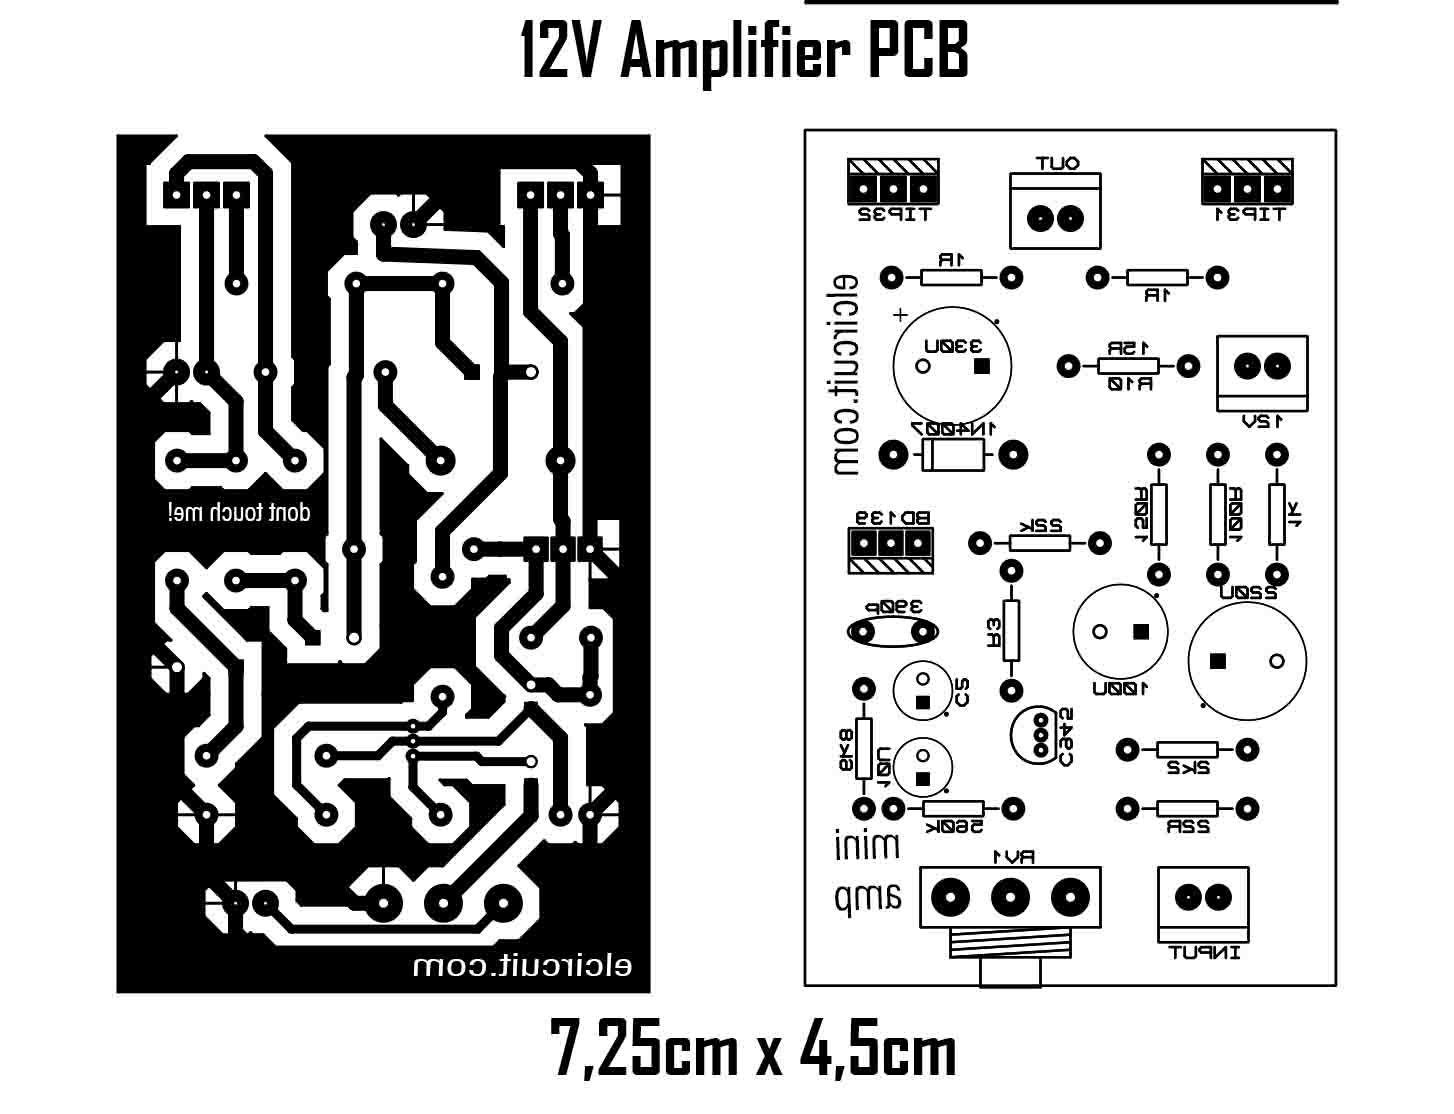 Diy Mini 12volt Power Amplifier Rangkaian Elektronik Desain Tata Letak Elektronik